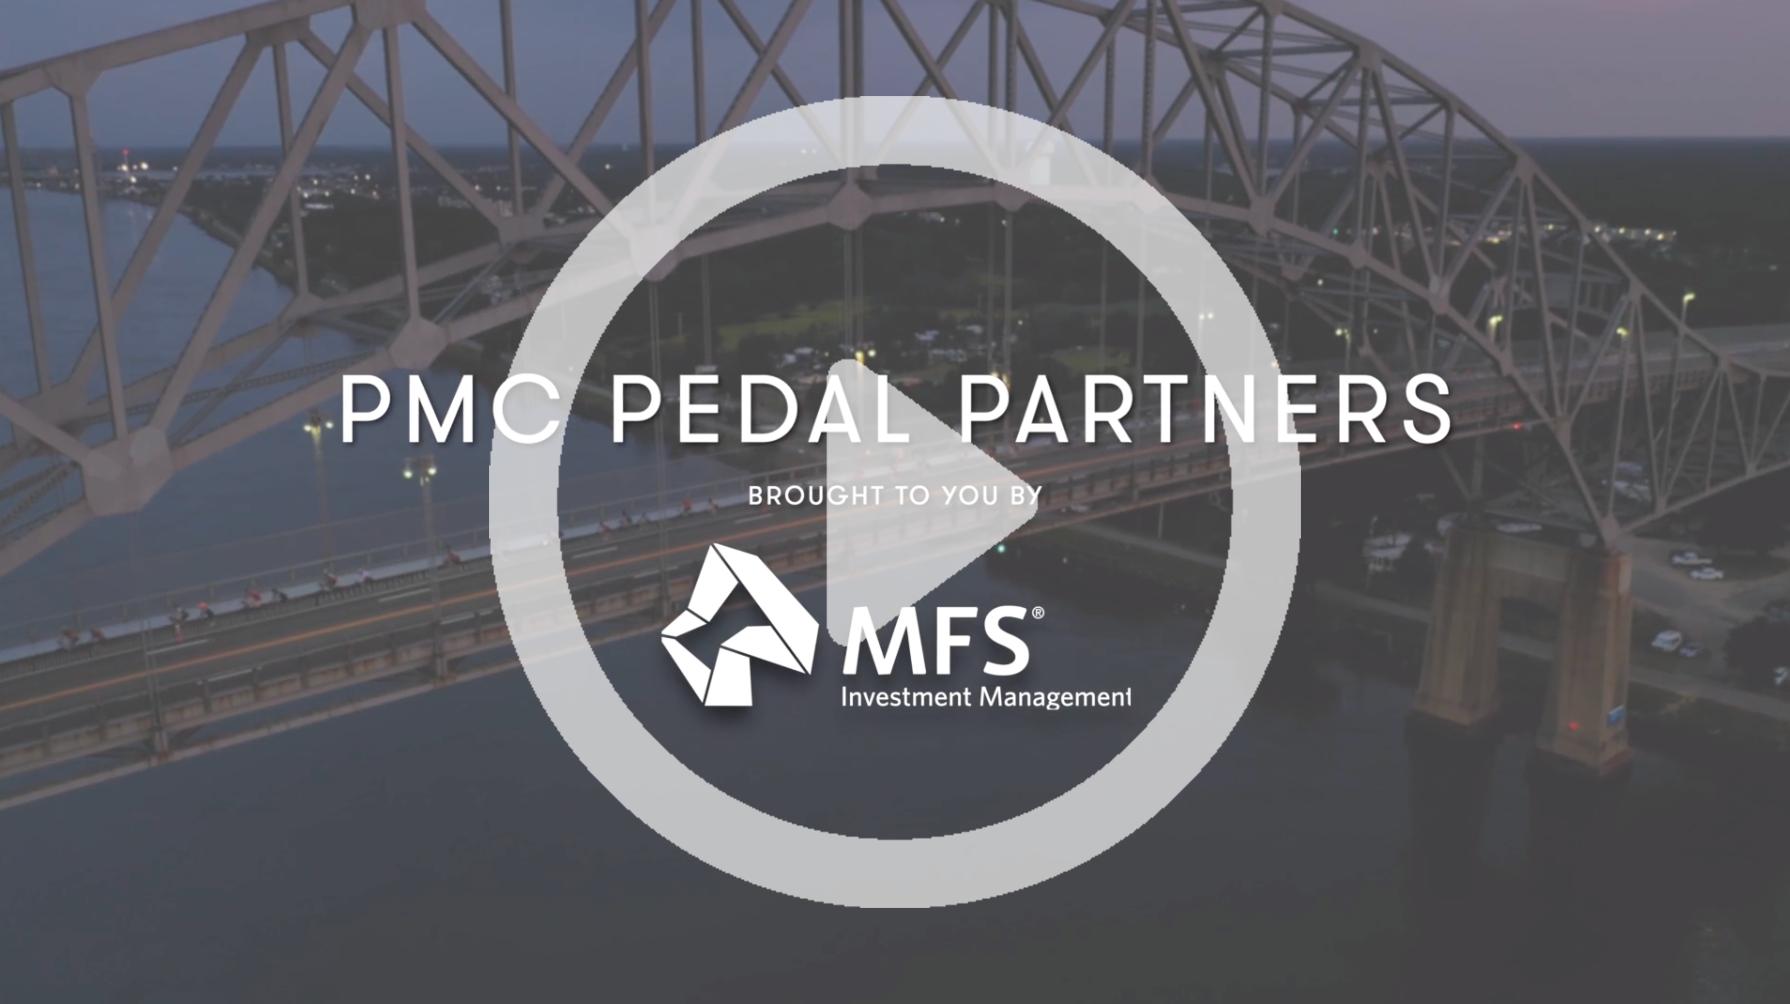 pmc-pedal-partner-video-screenshot